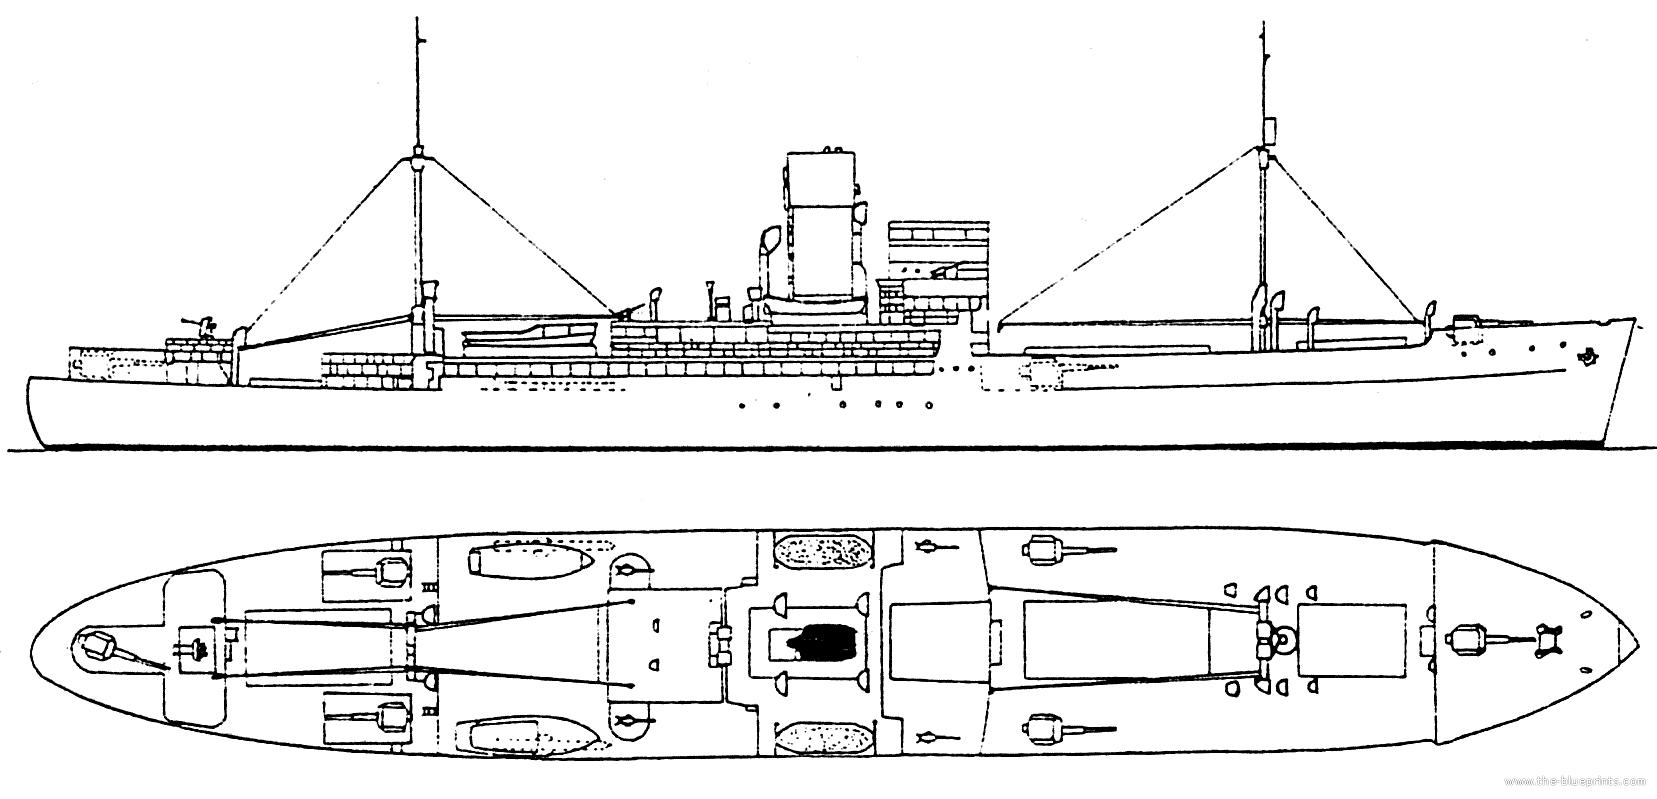 Blueprints ships cruisers germany dkm thor hsk 4 1940 dkm thor hsk 4 1940 auxiliary cruiser ex santa cruz malvernweather Images